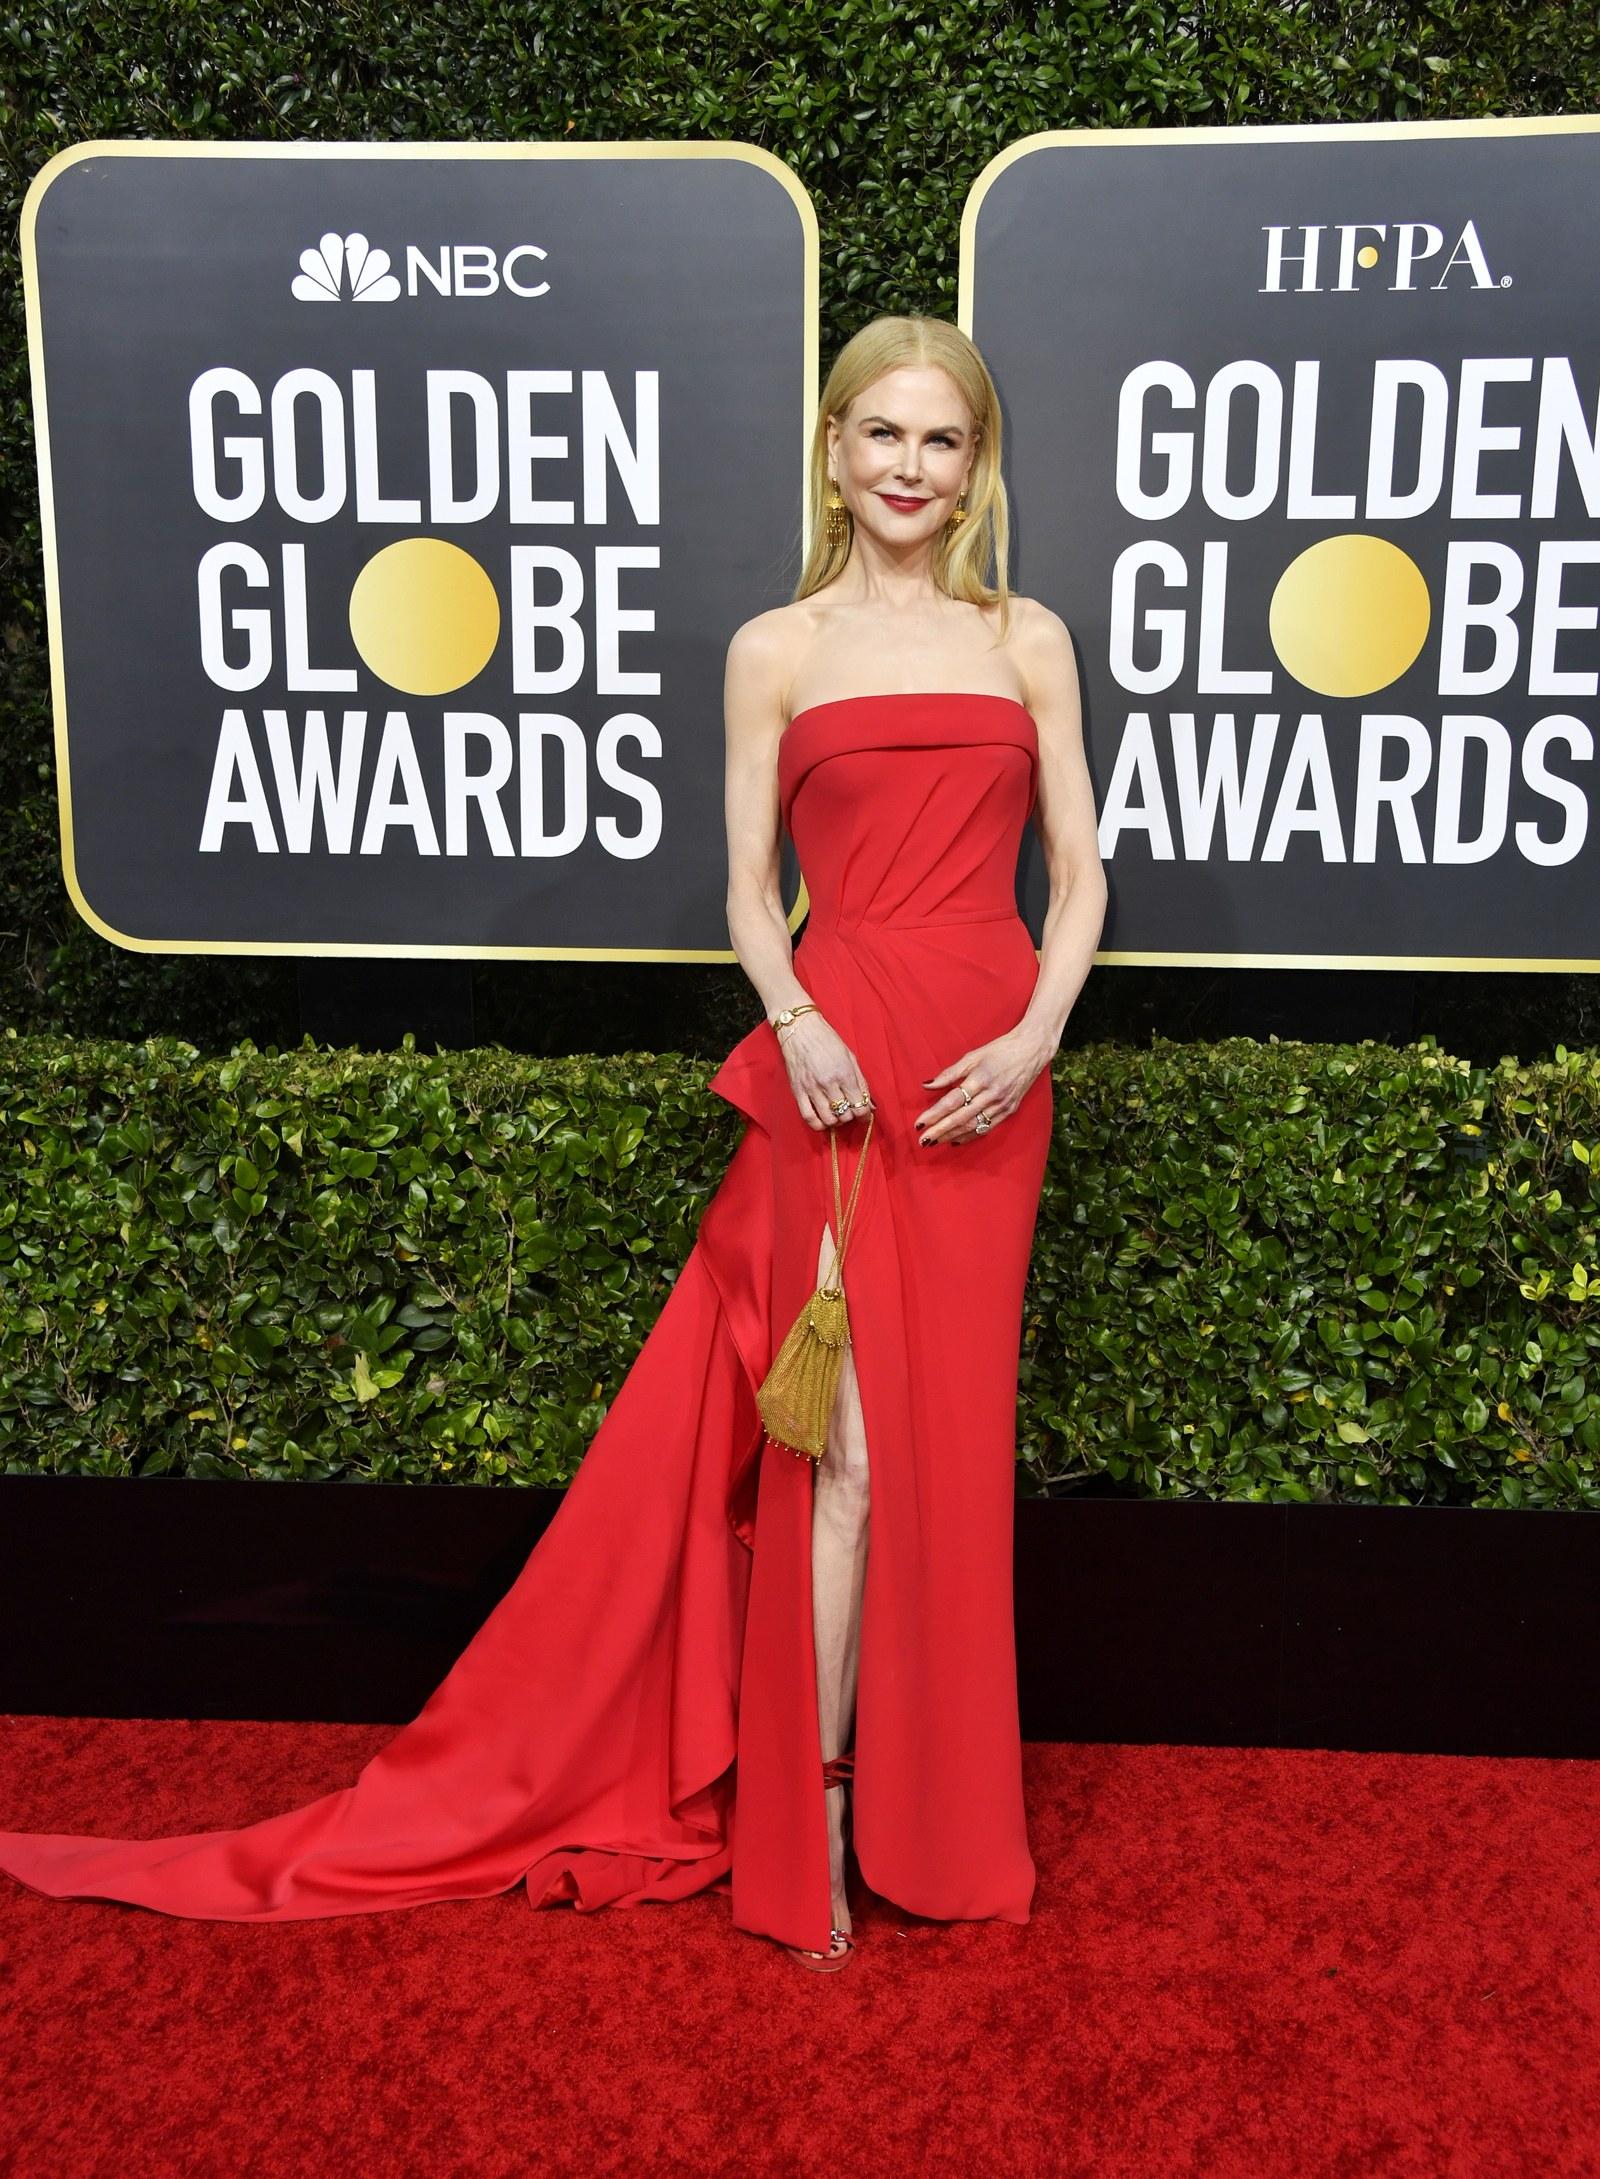 Nicole Kidman - Atelier Versace